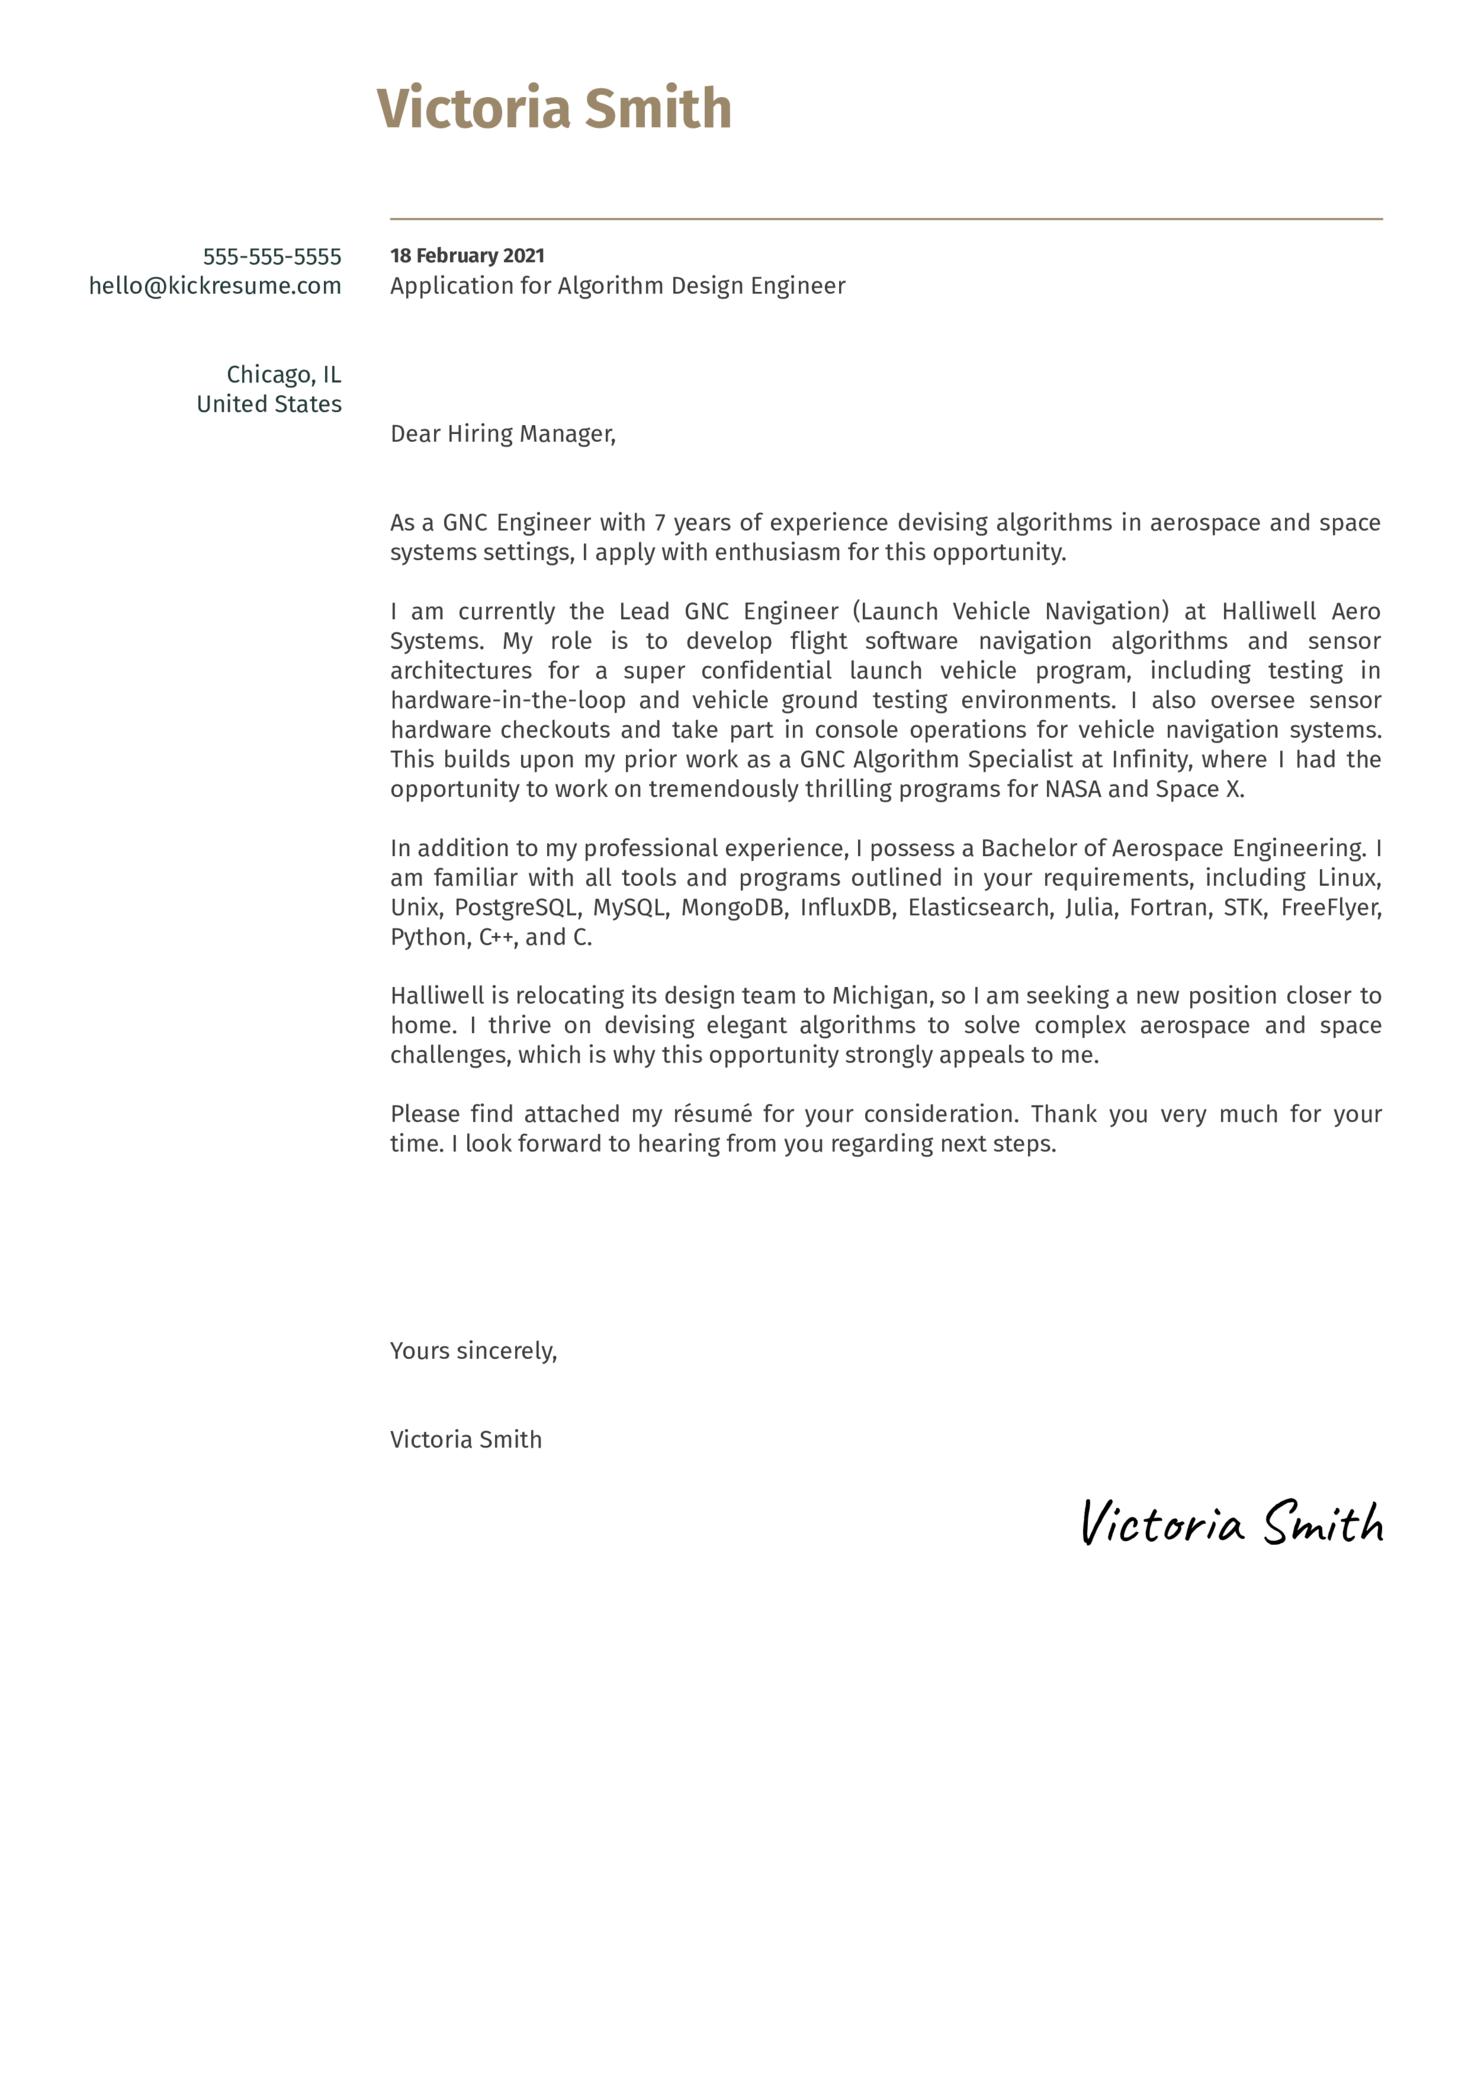 Algorithm Design Engineer Cover Letter Example